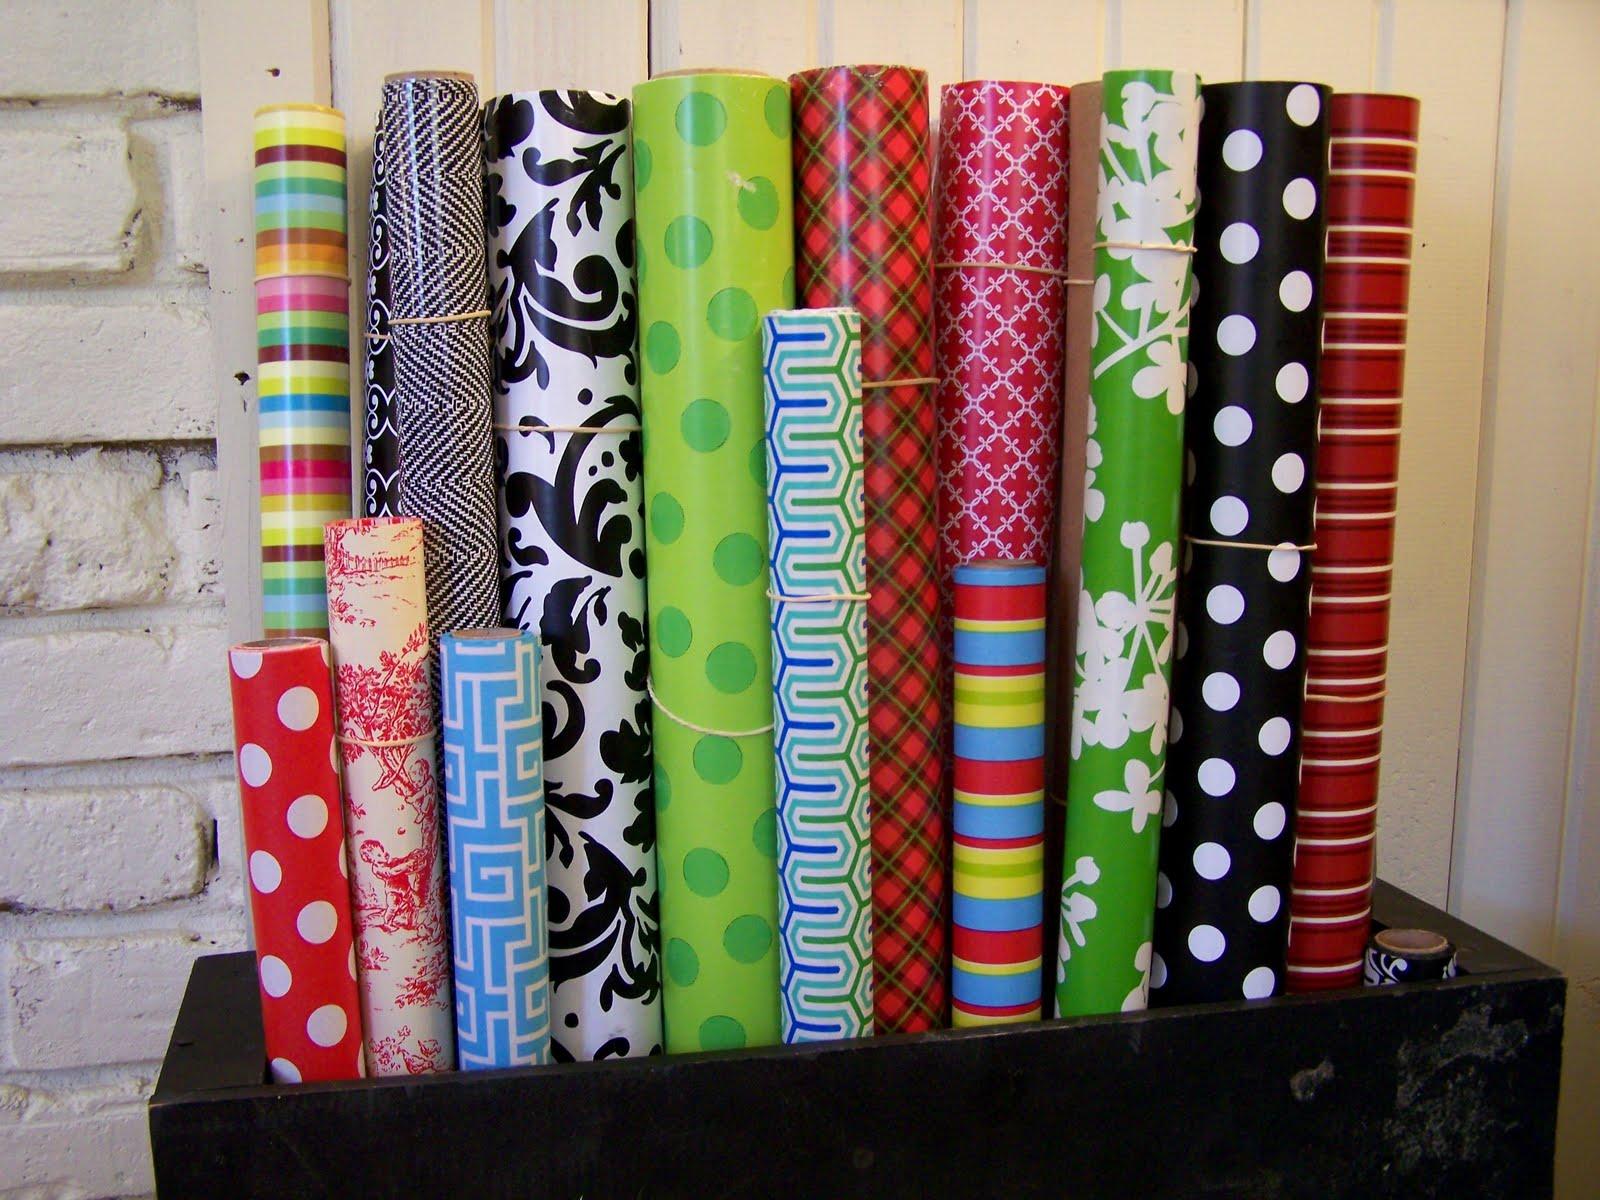 Cheap craft room storage ideas - Cheap Craft Room Storage Ideas 35